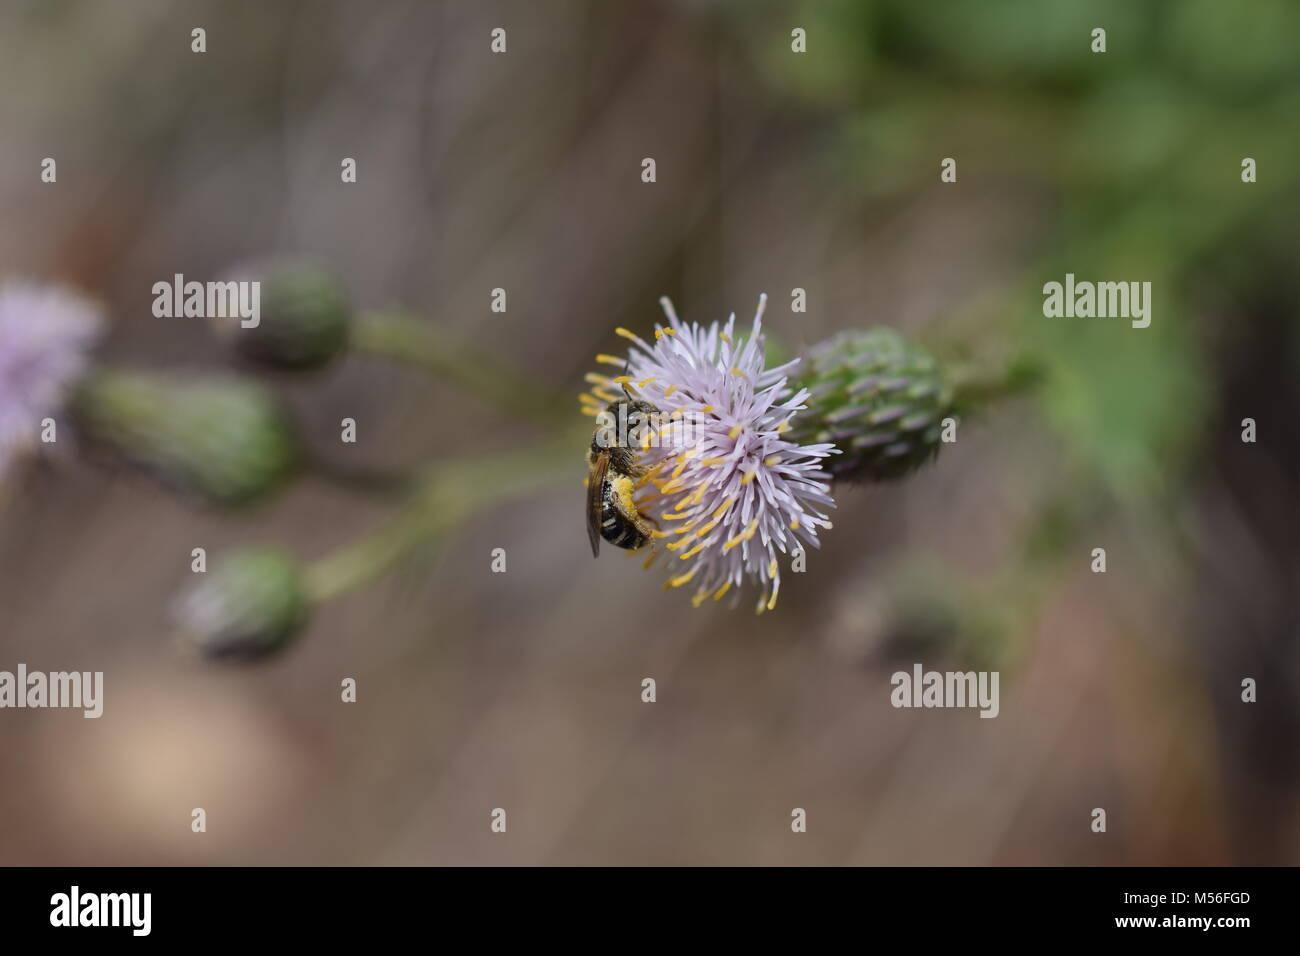 Bee on Purple Flower - Stock Image